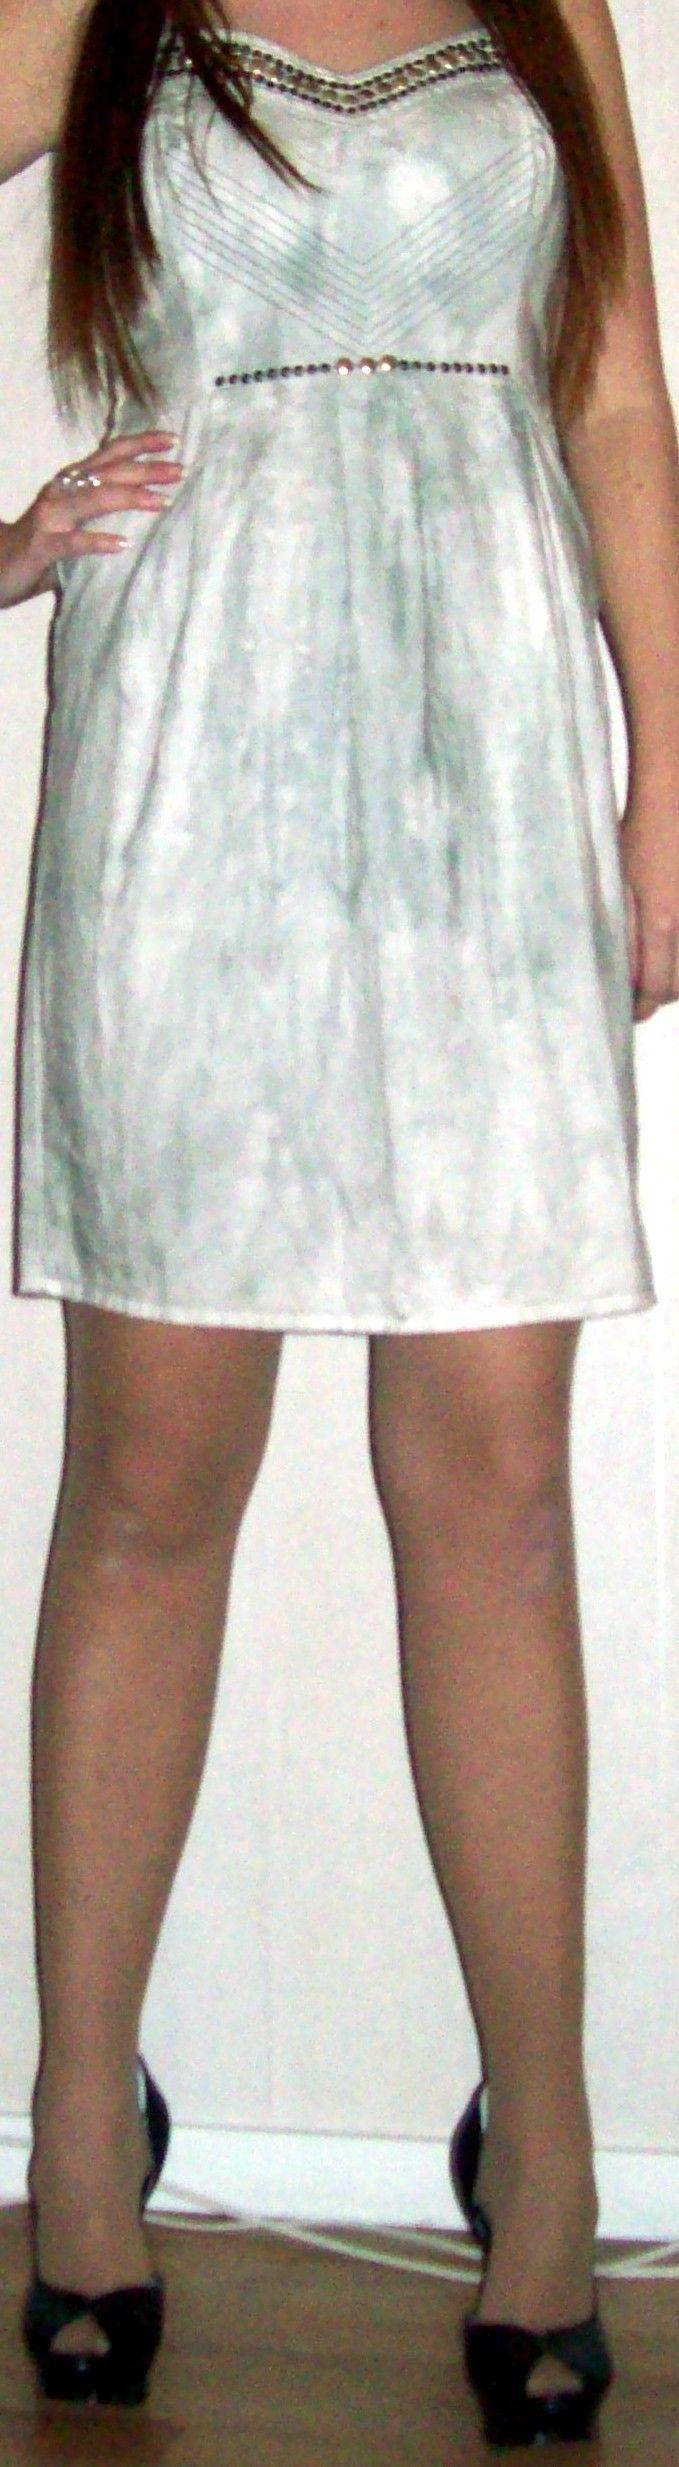 #myfavoritedress #dress #pretty #fashion #style #blue #clothing #shoes #highheel